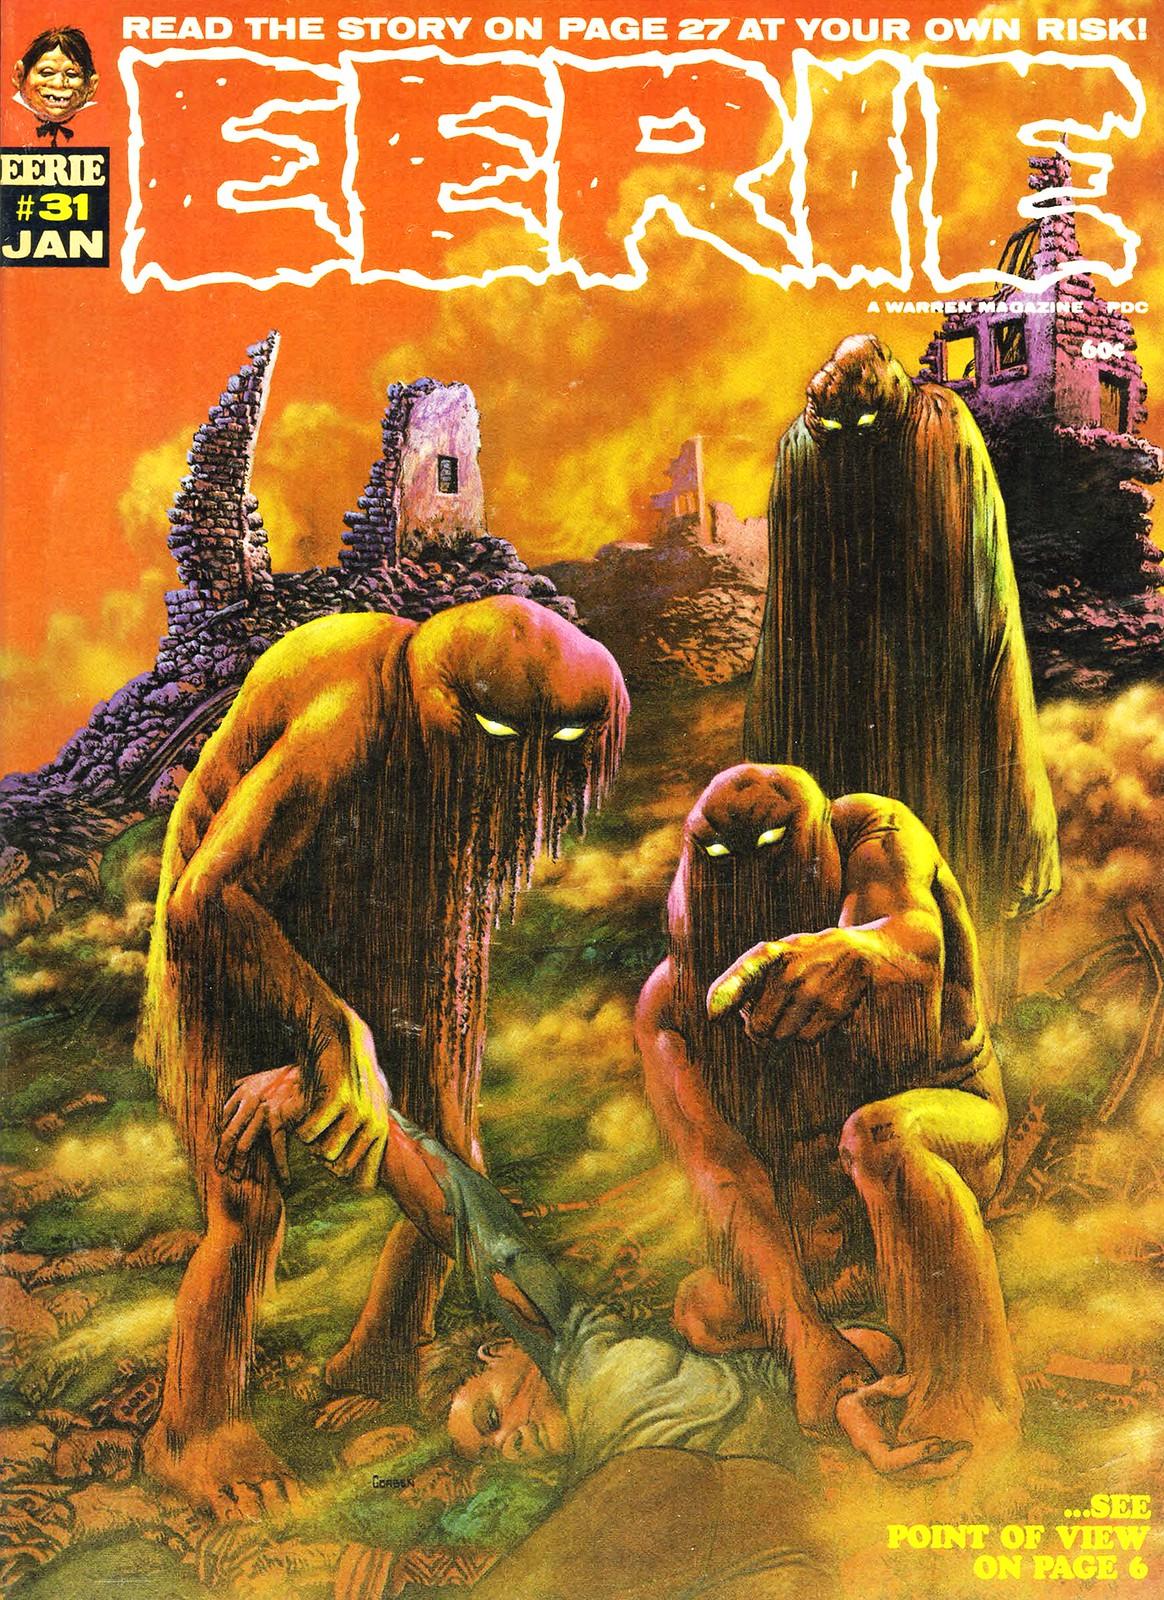 Richard Corben - Eerie #31, January 1971